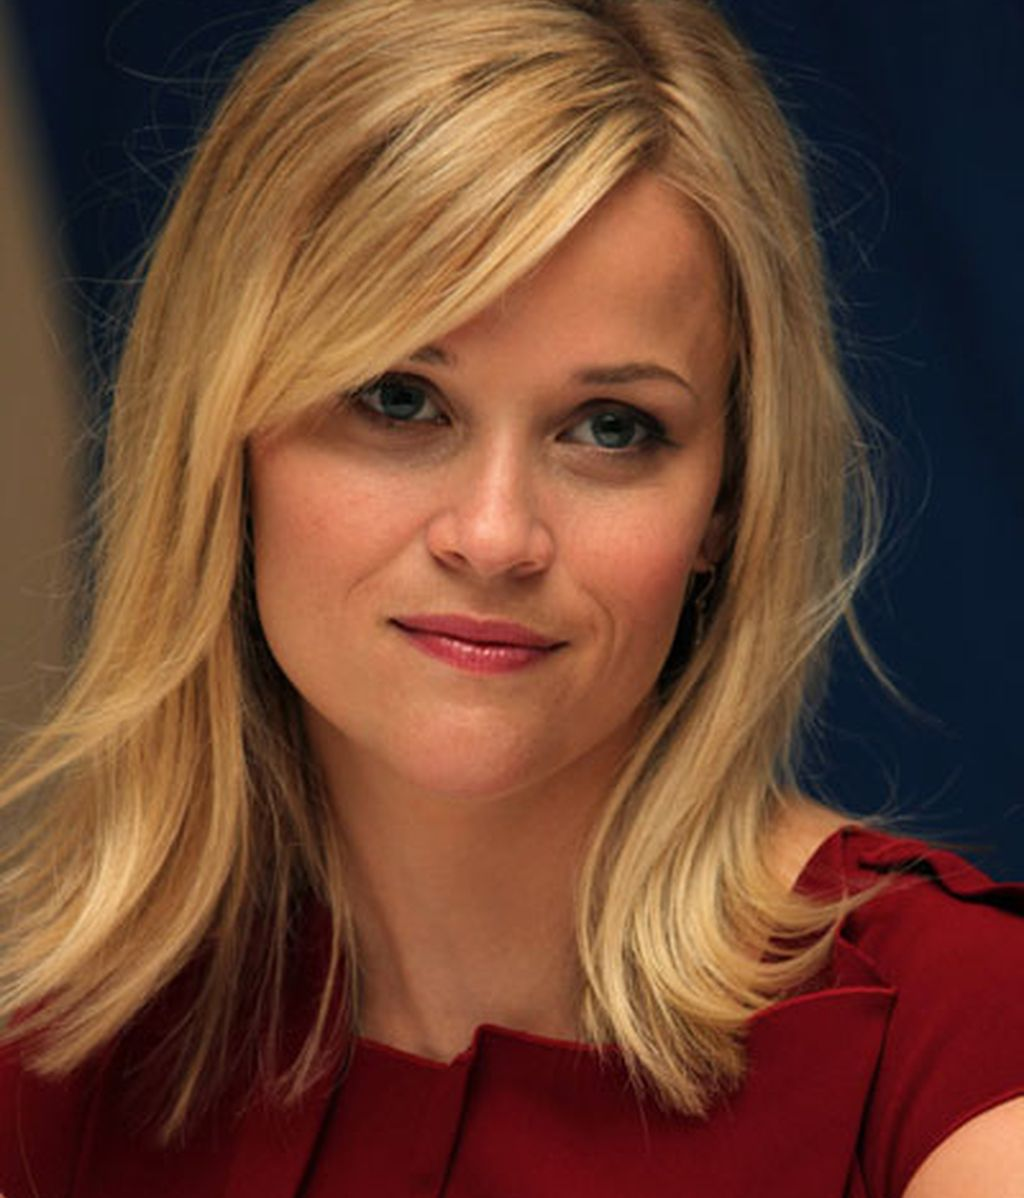 3.Reese Whiterspoon